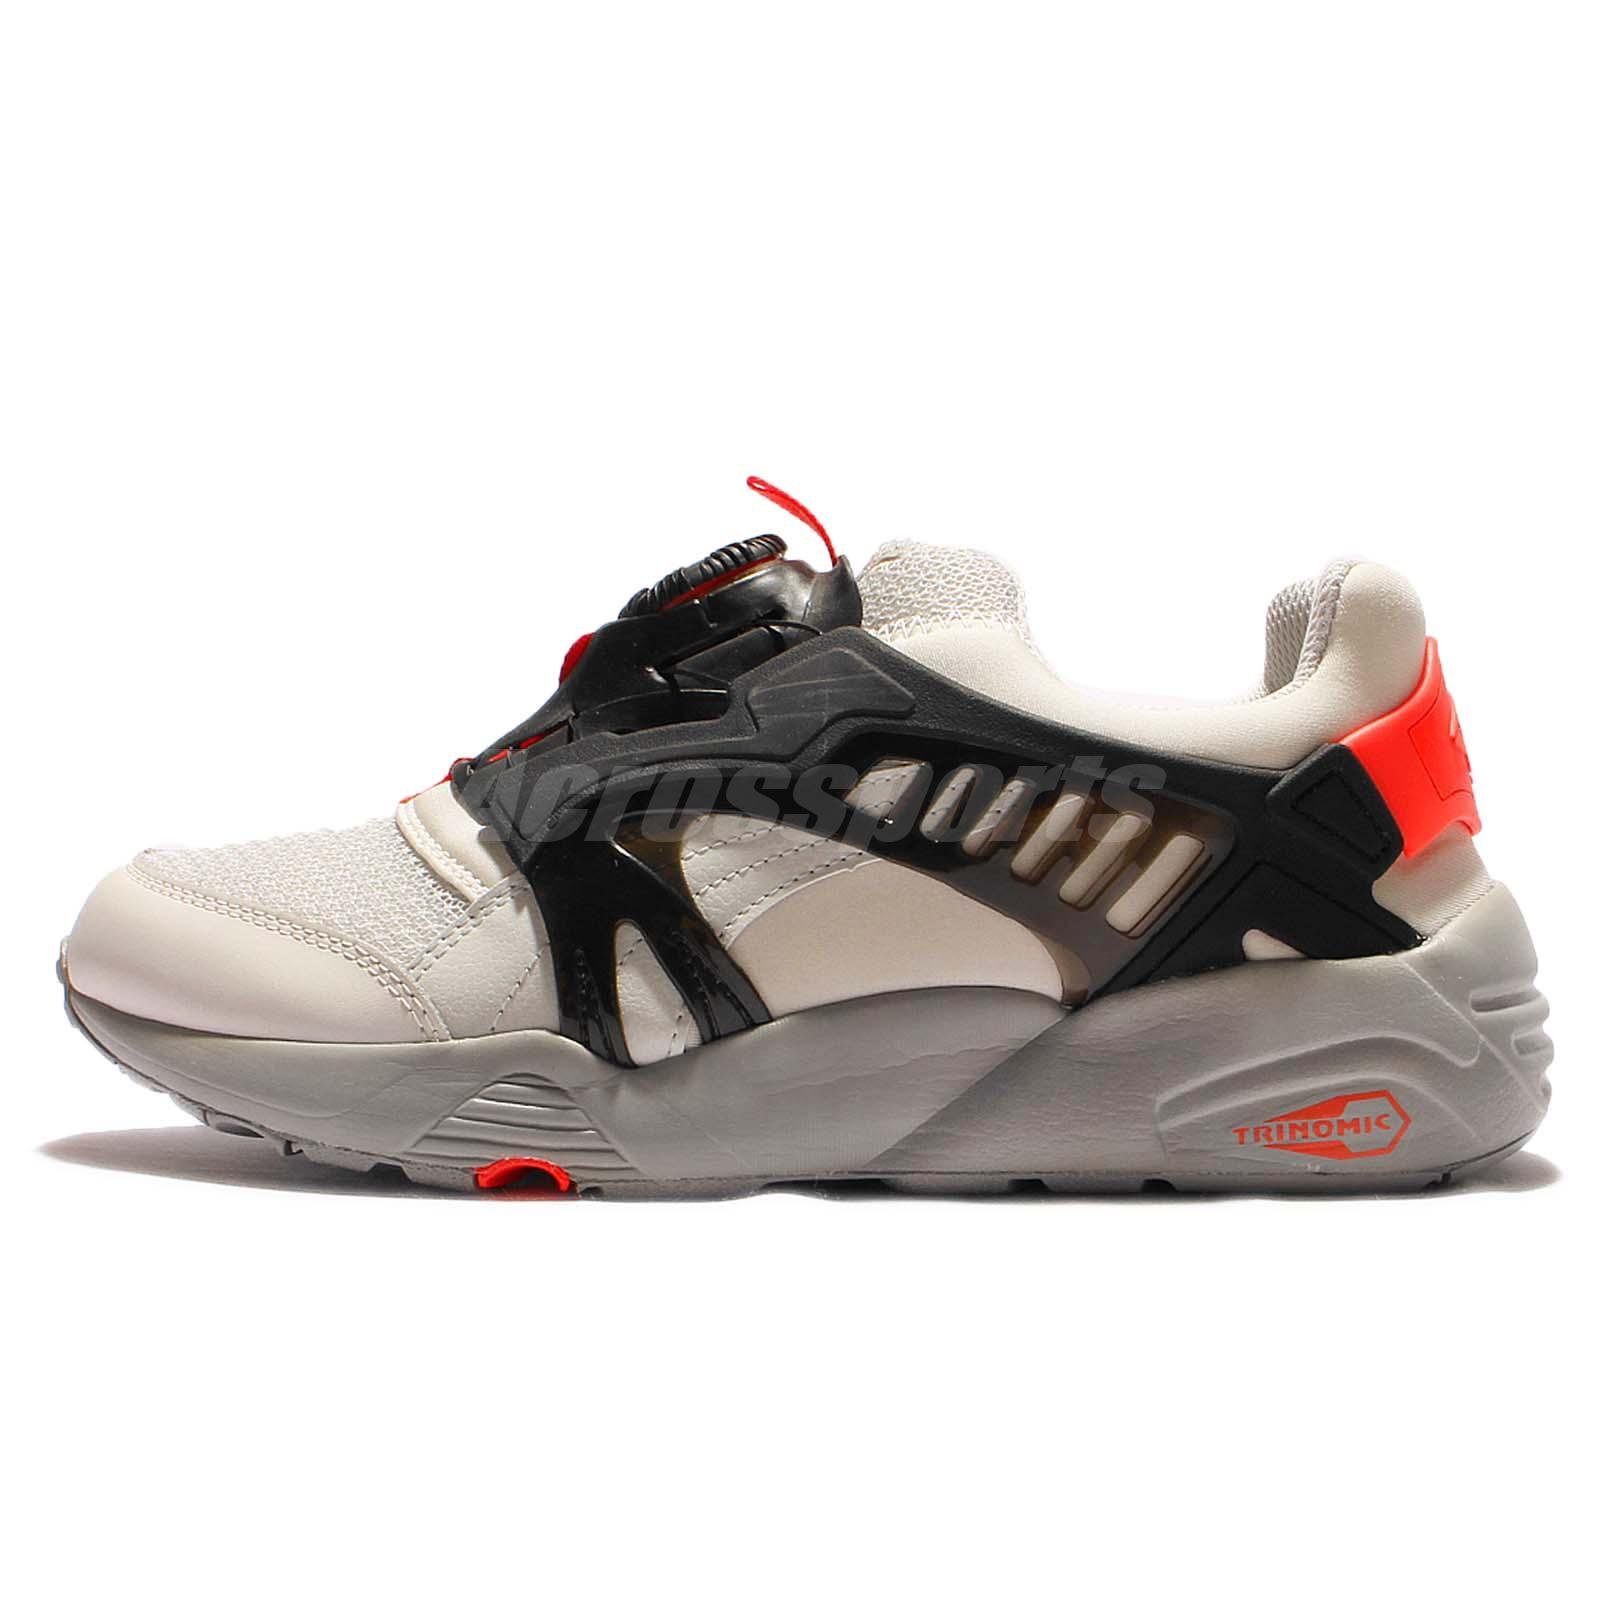 puma disc shoes for sale